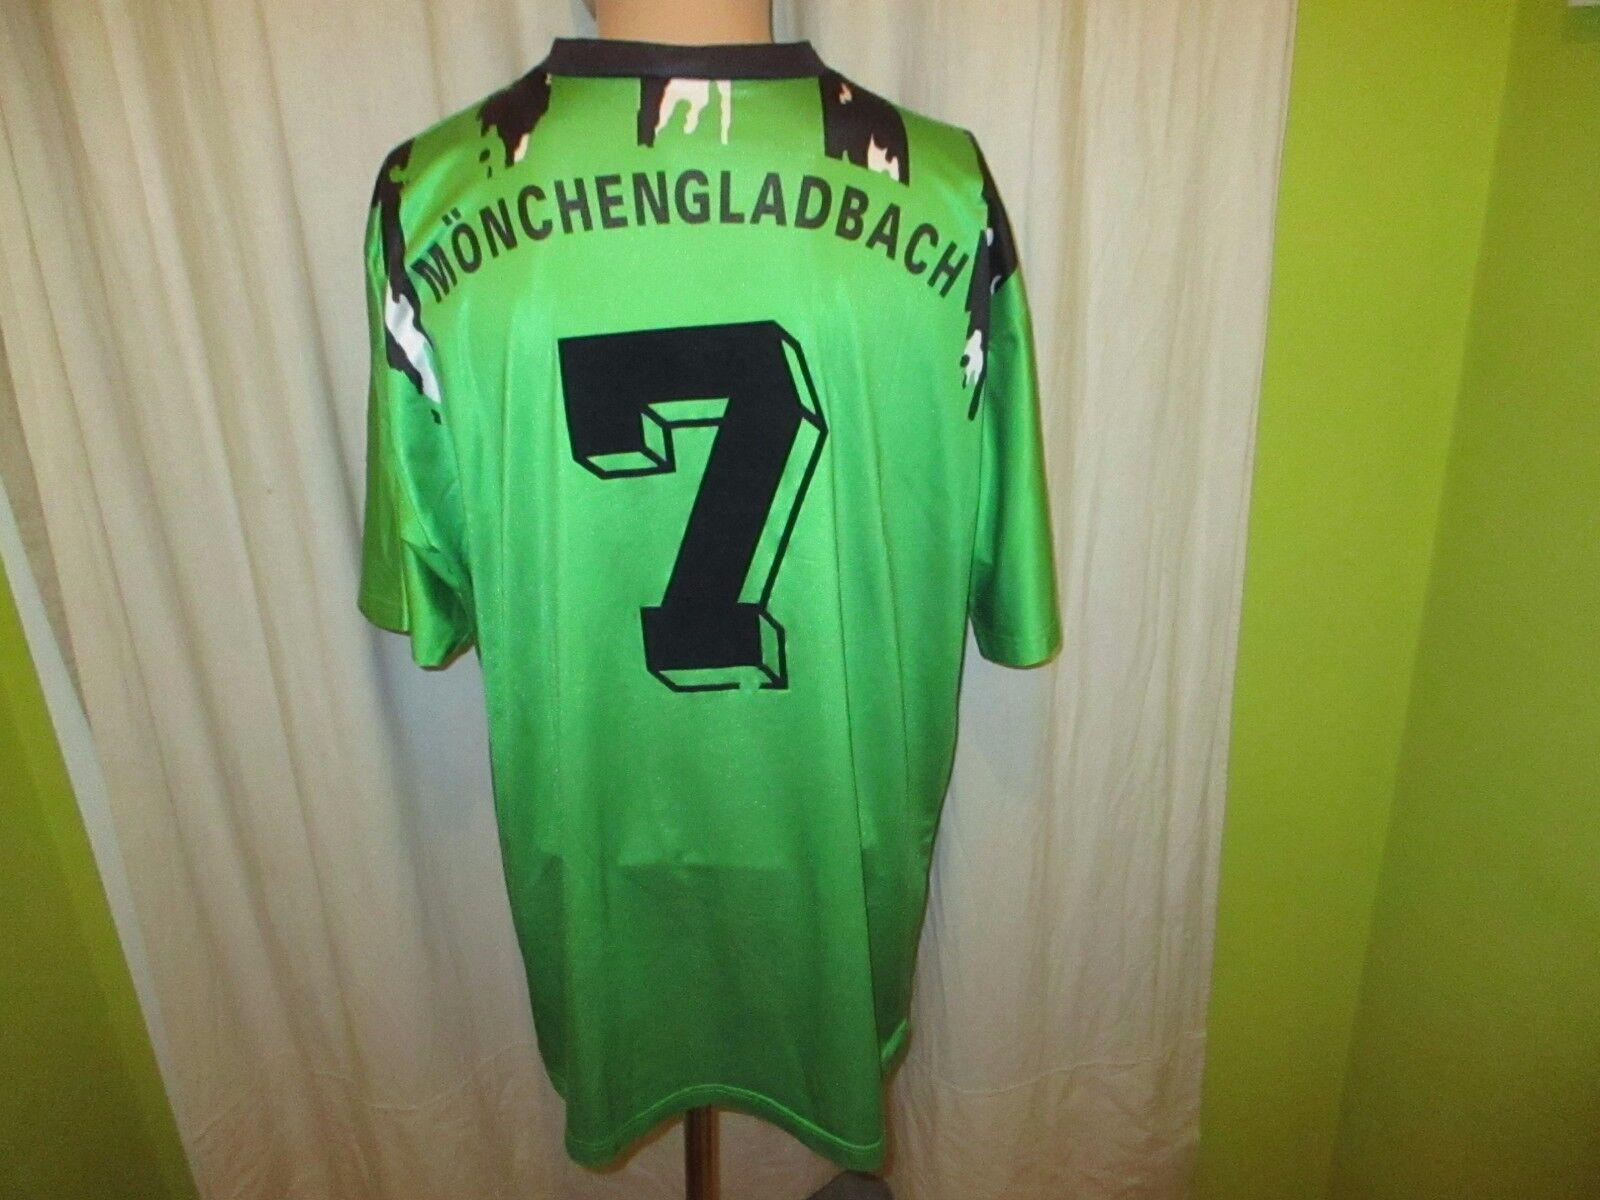 Borussia Mönchengladbach asics asics Mönchengladbach Auswärts Trikot 1994/95